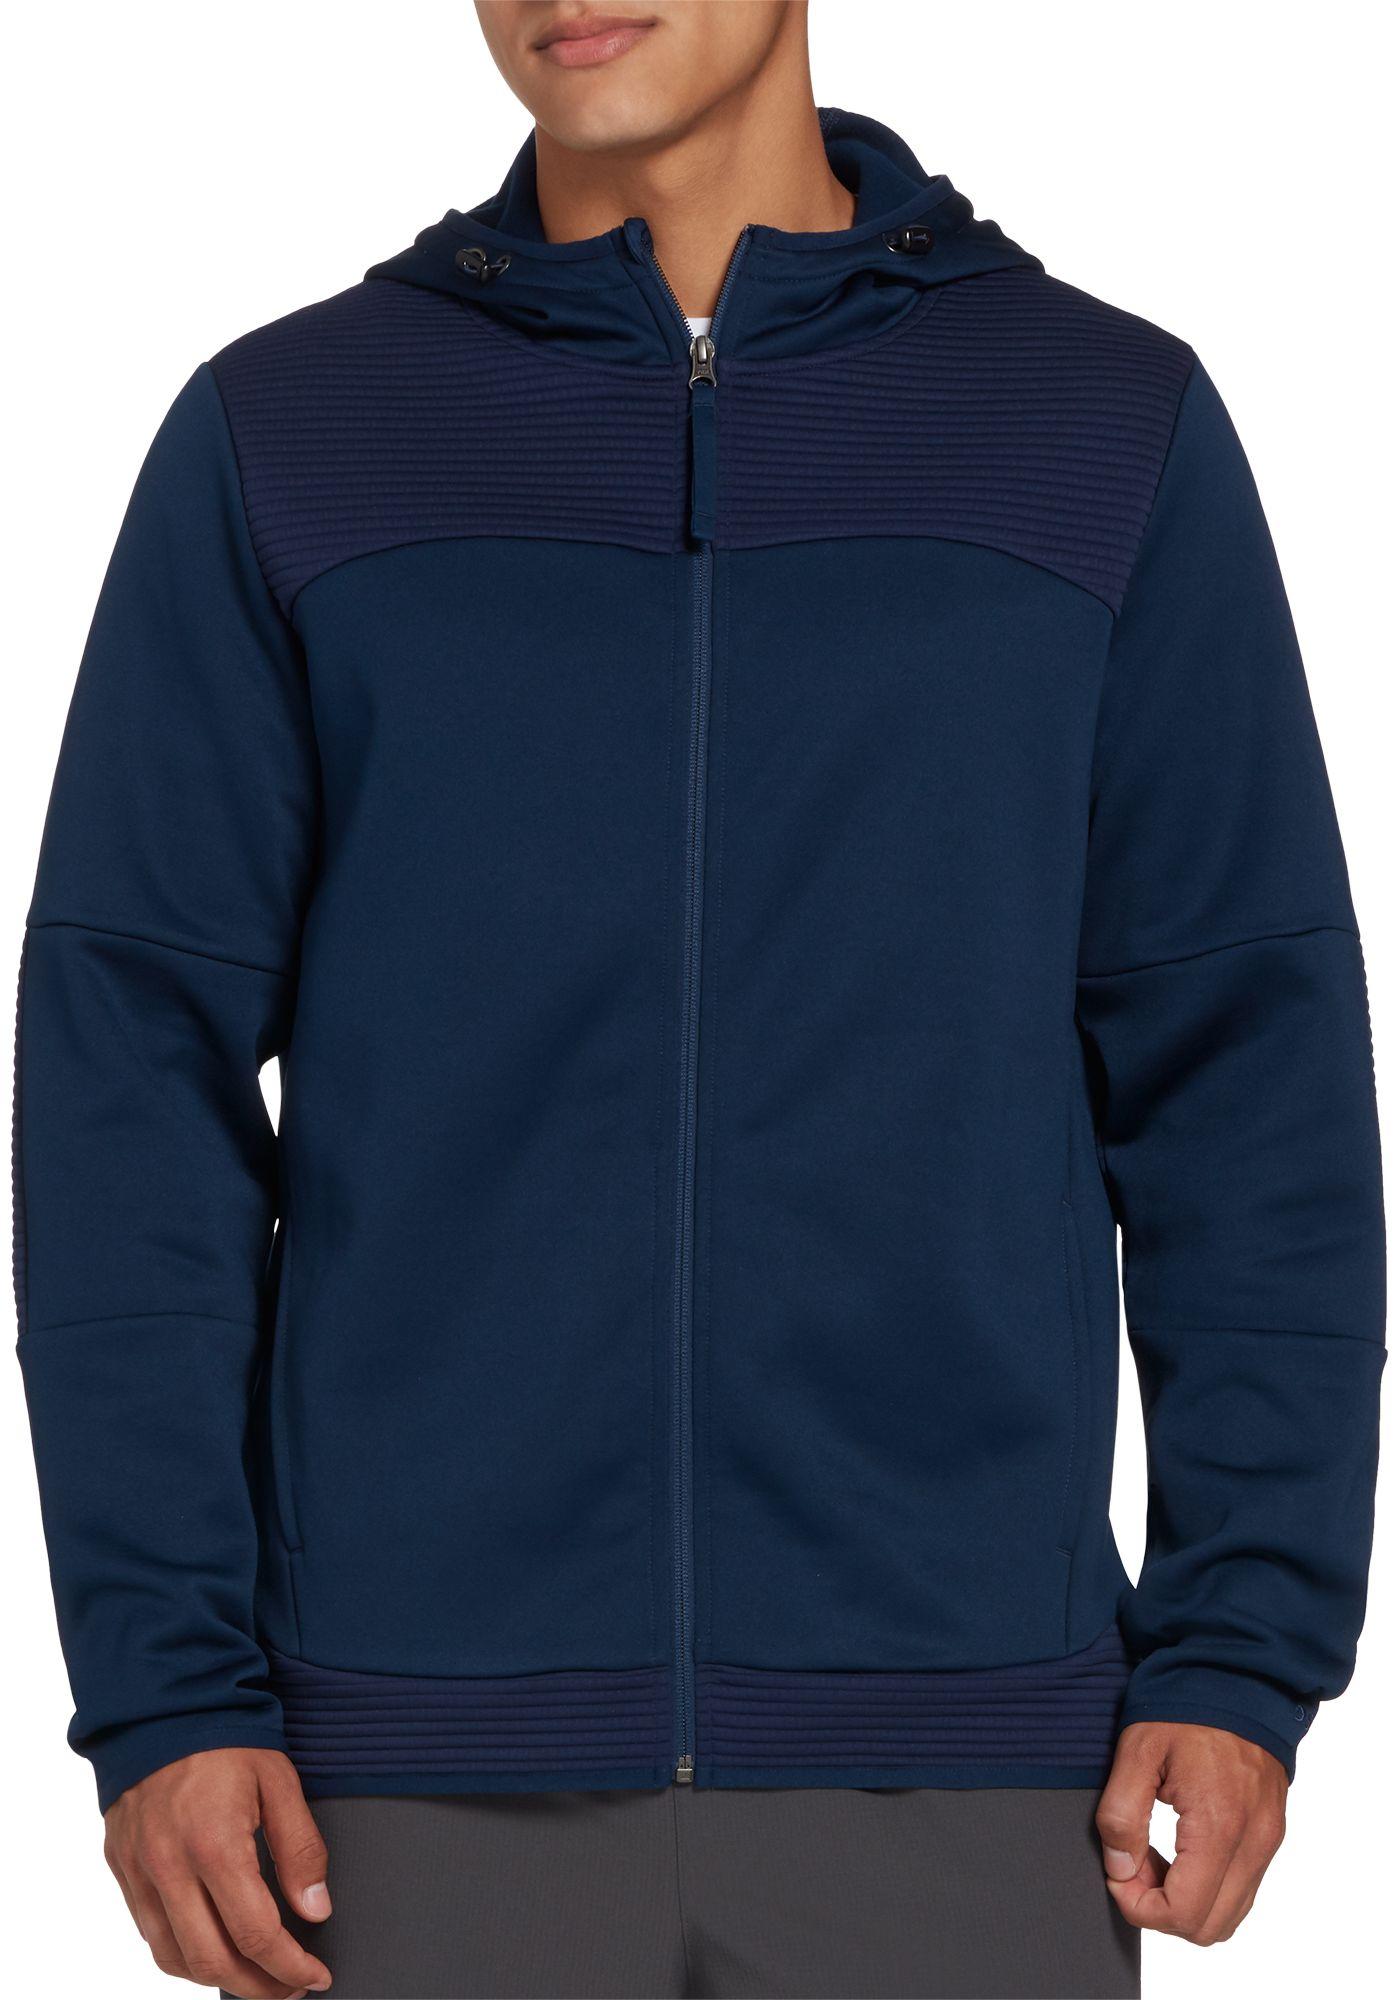 DSG Men's Showstopper Jacket